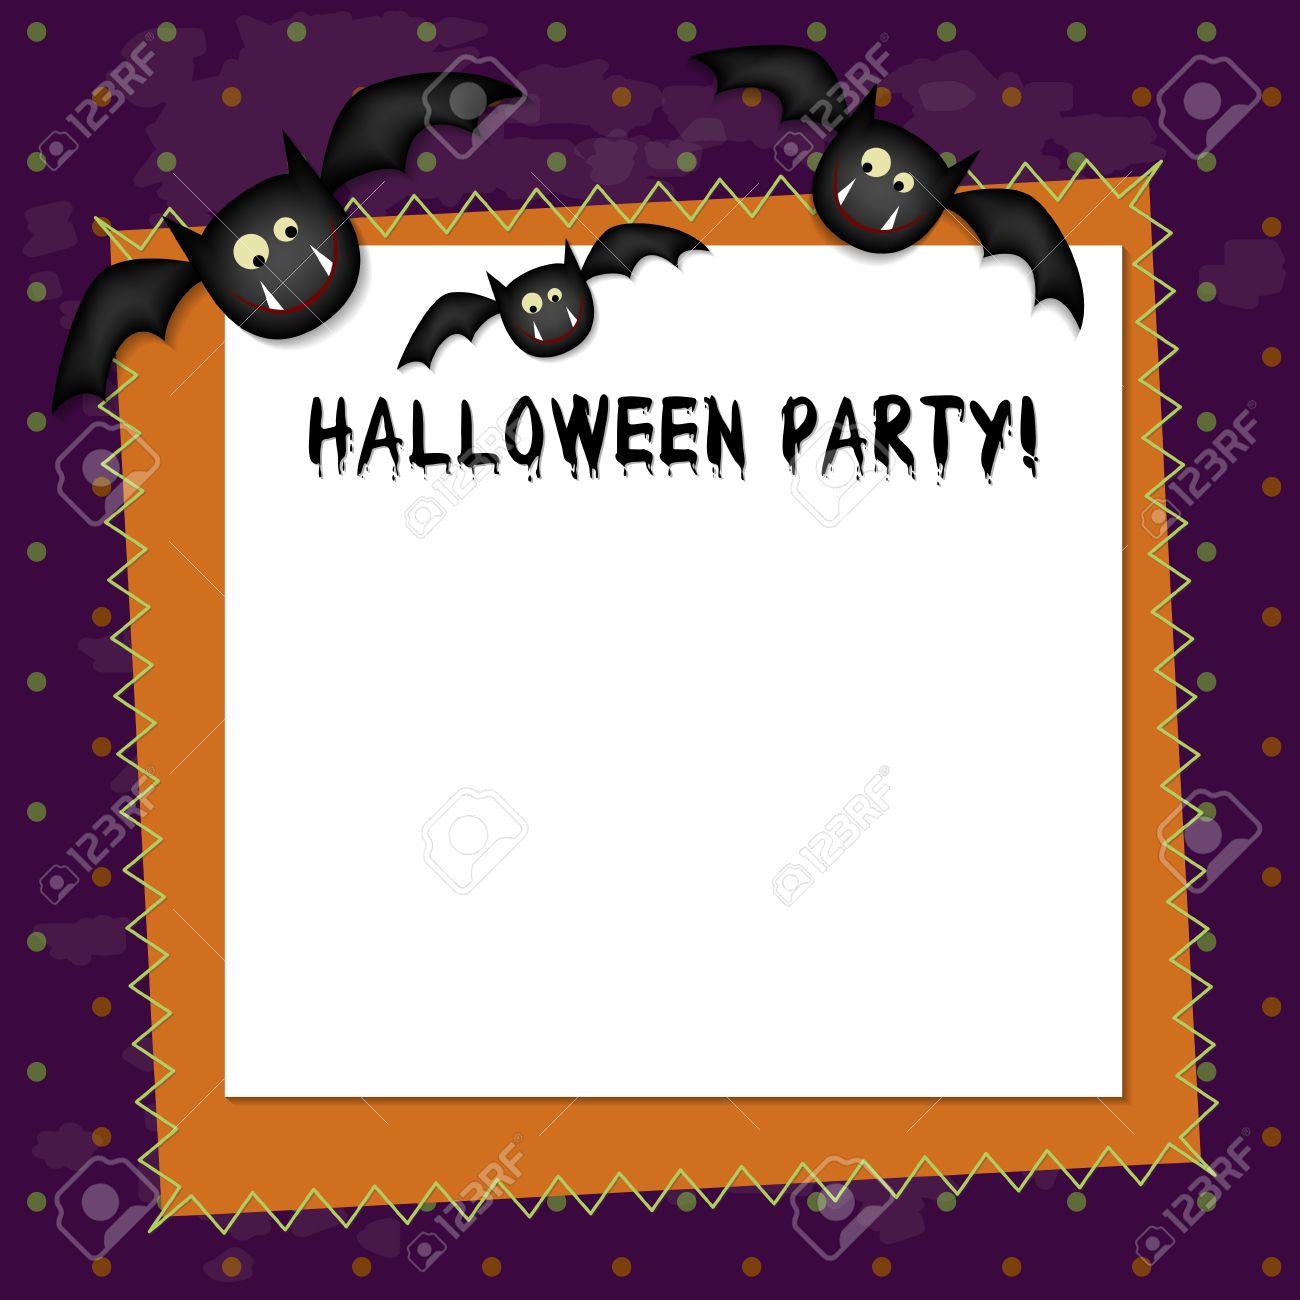 Halloween Party Invitation Funny Halloween Party Invitation ...